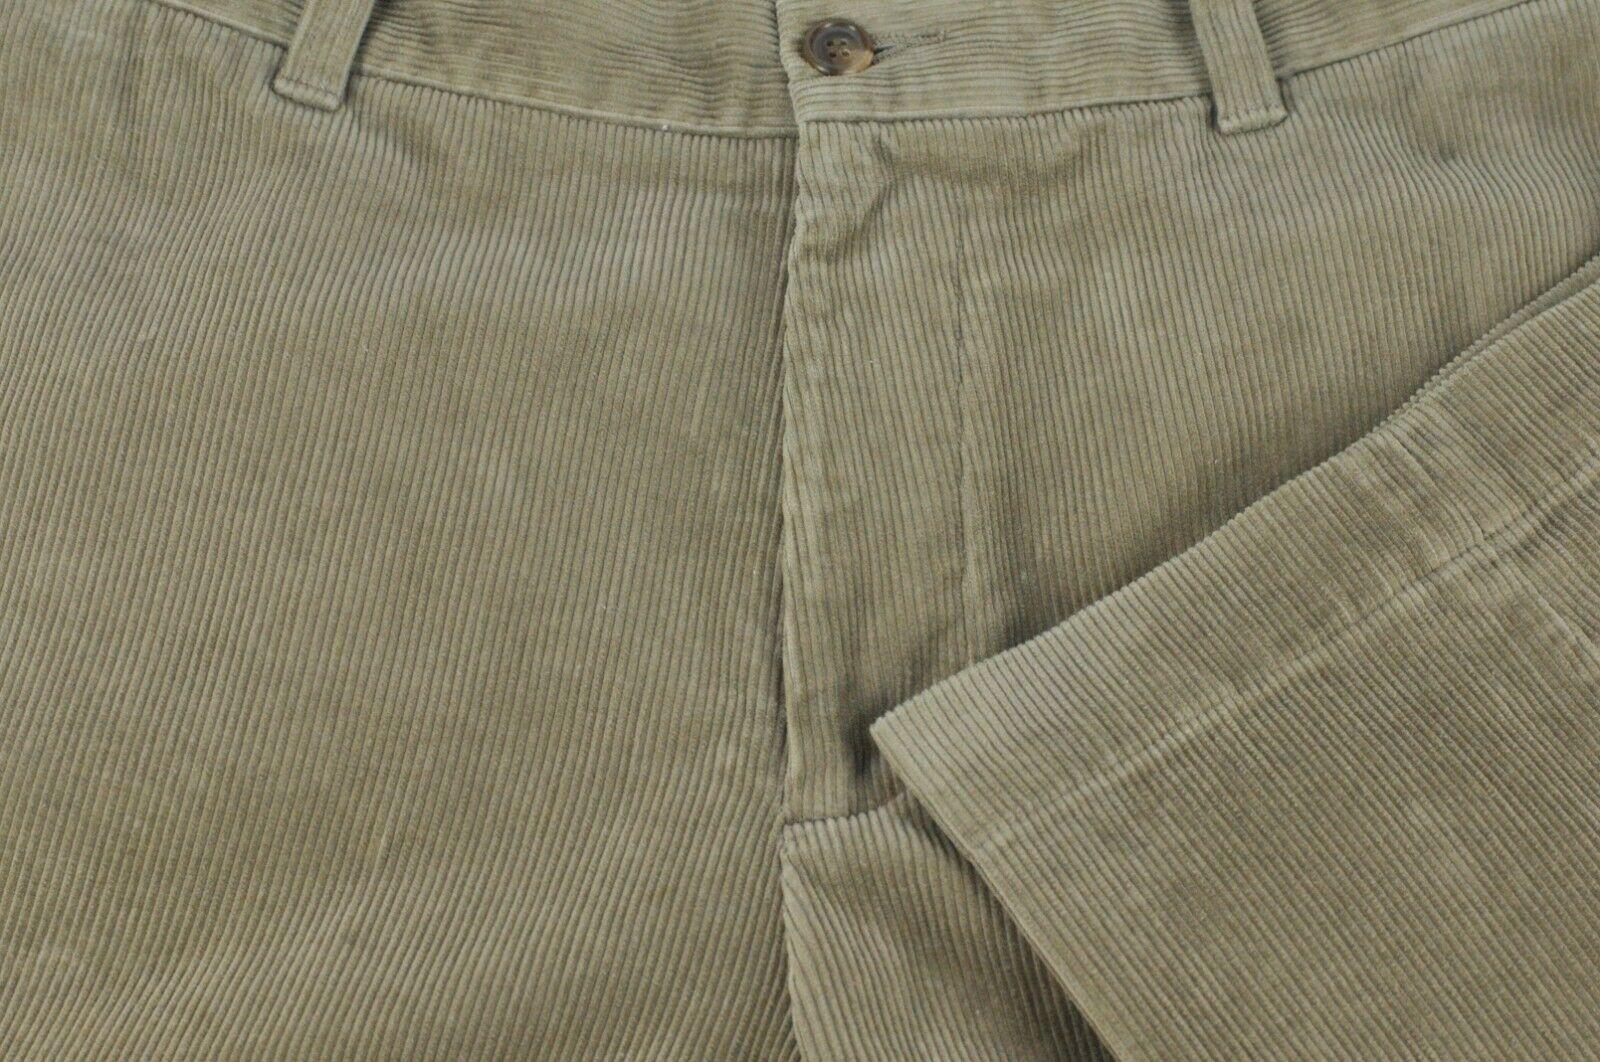 Brooks Bredhers 346 Men's Cafe Brown Corduroy Cotton Dress Pants 31 x 30